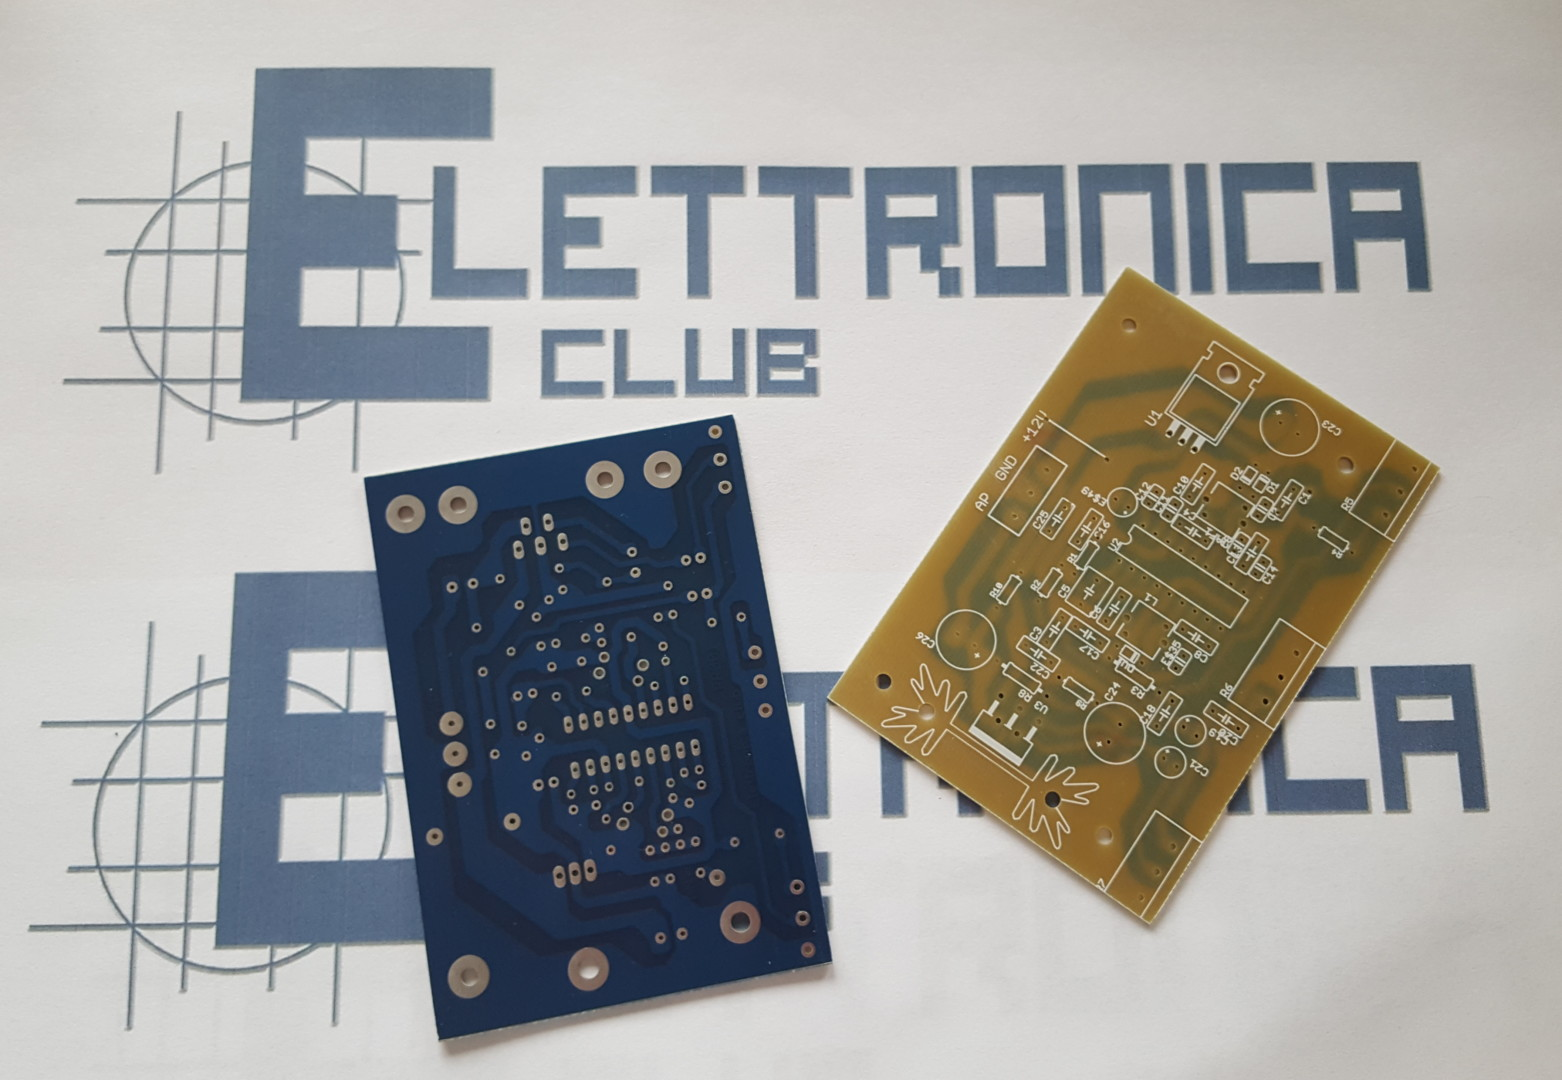 Rr001 Pcb Radioricevitore Fm Con Tda7000 Elettronica Club Radio Receiver Using Circuit Diagram